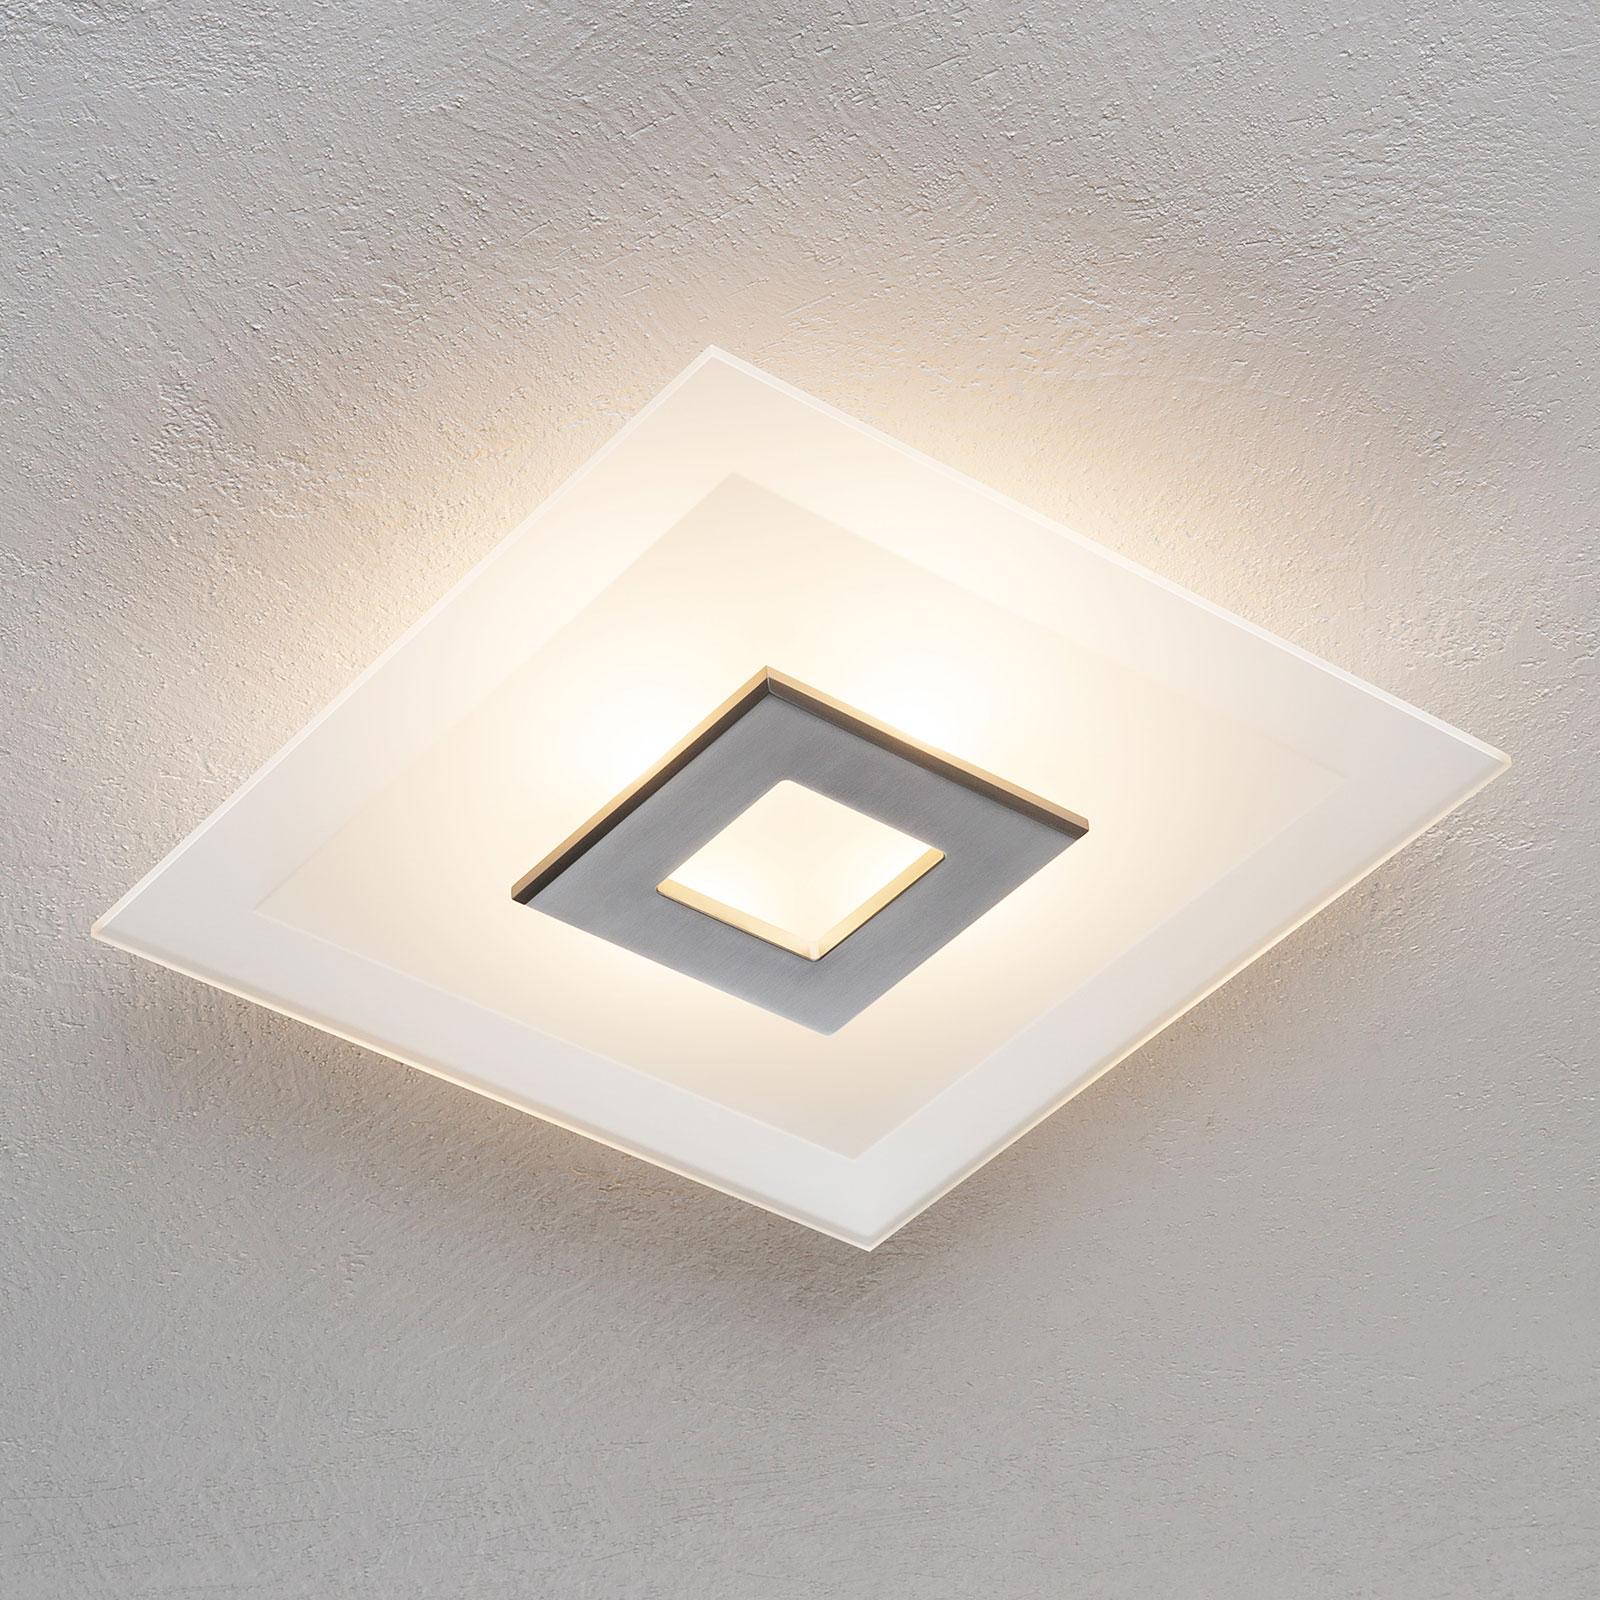 LED-kattovalaisin Tian, lasivarjostin, 39 cm